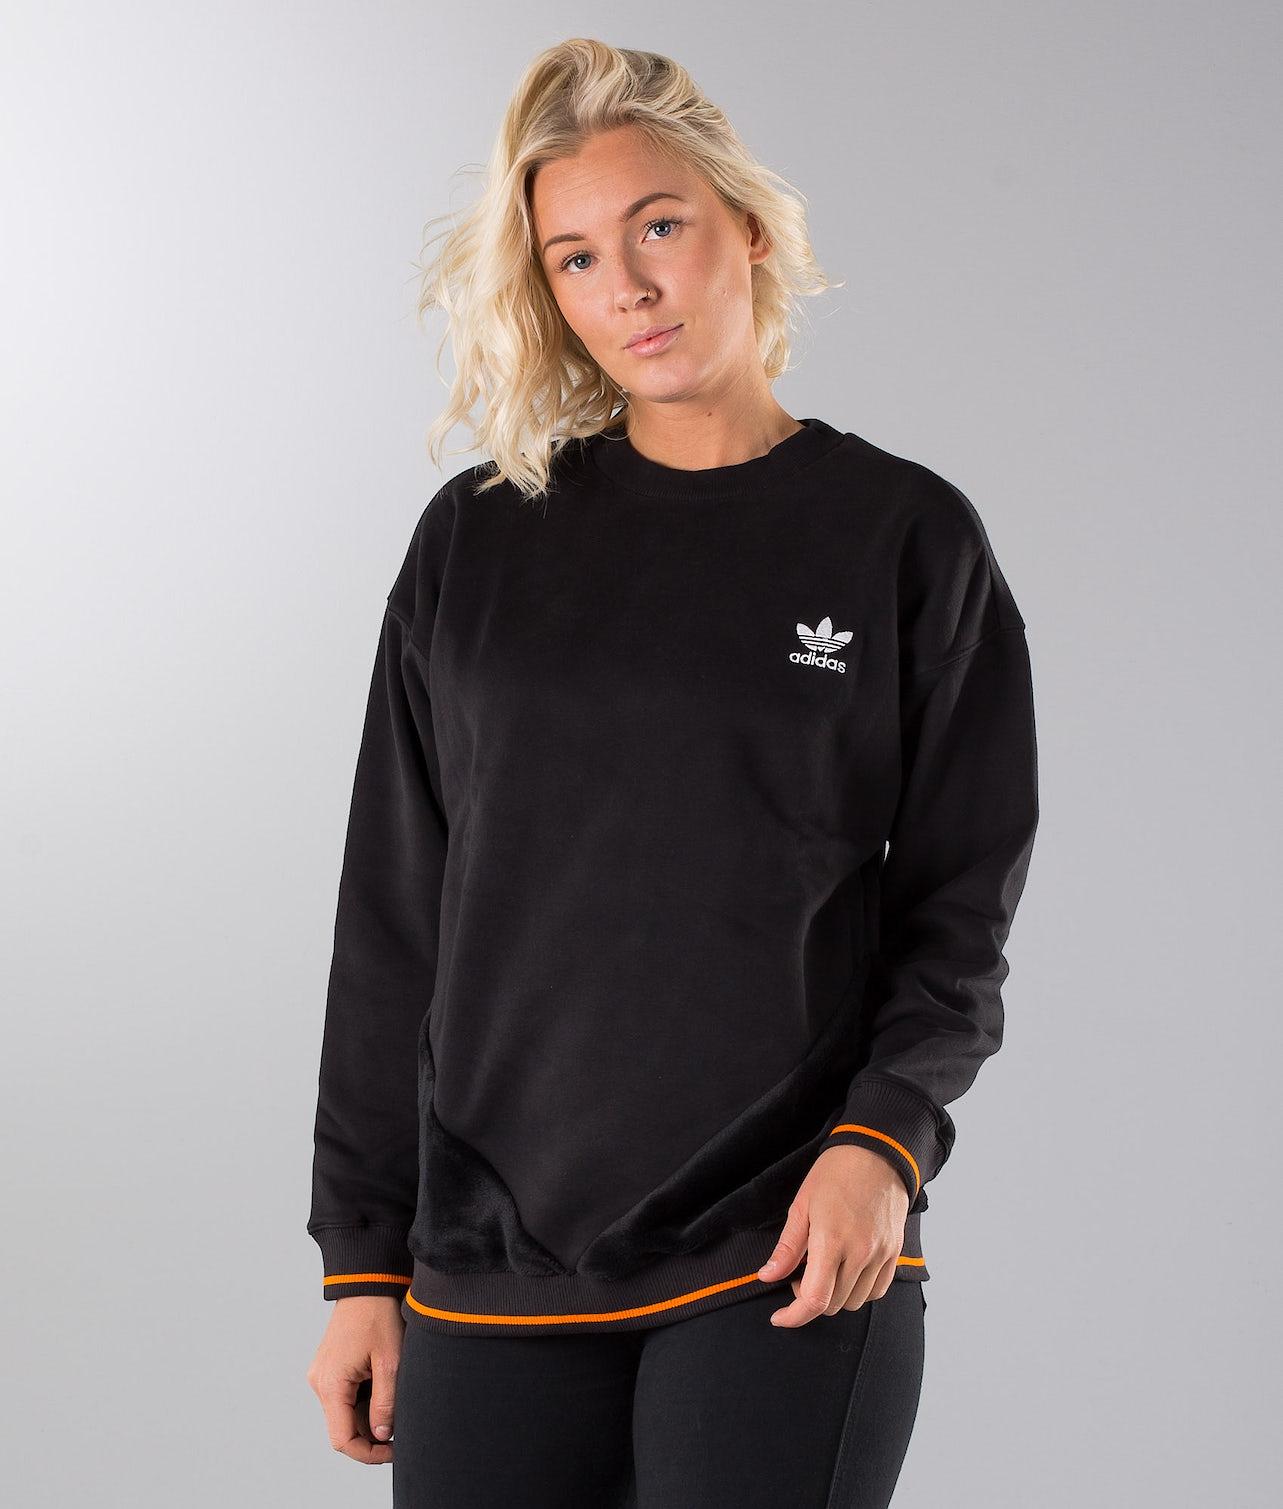 Adidas Originals Colorado Tröja Black